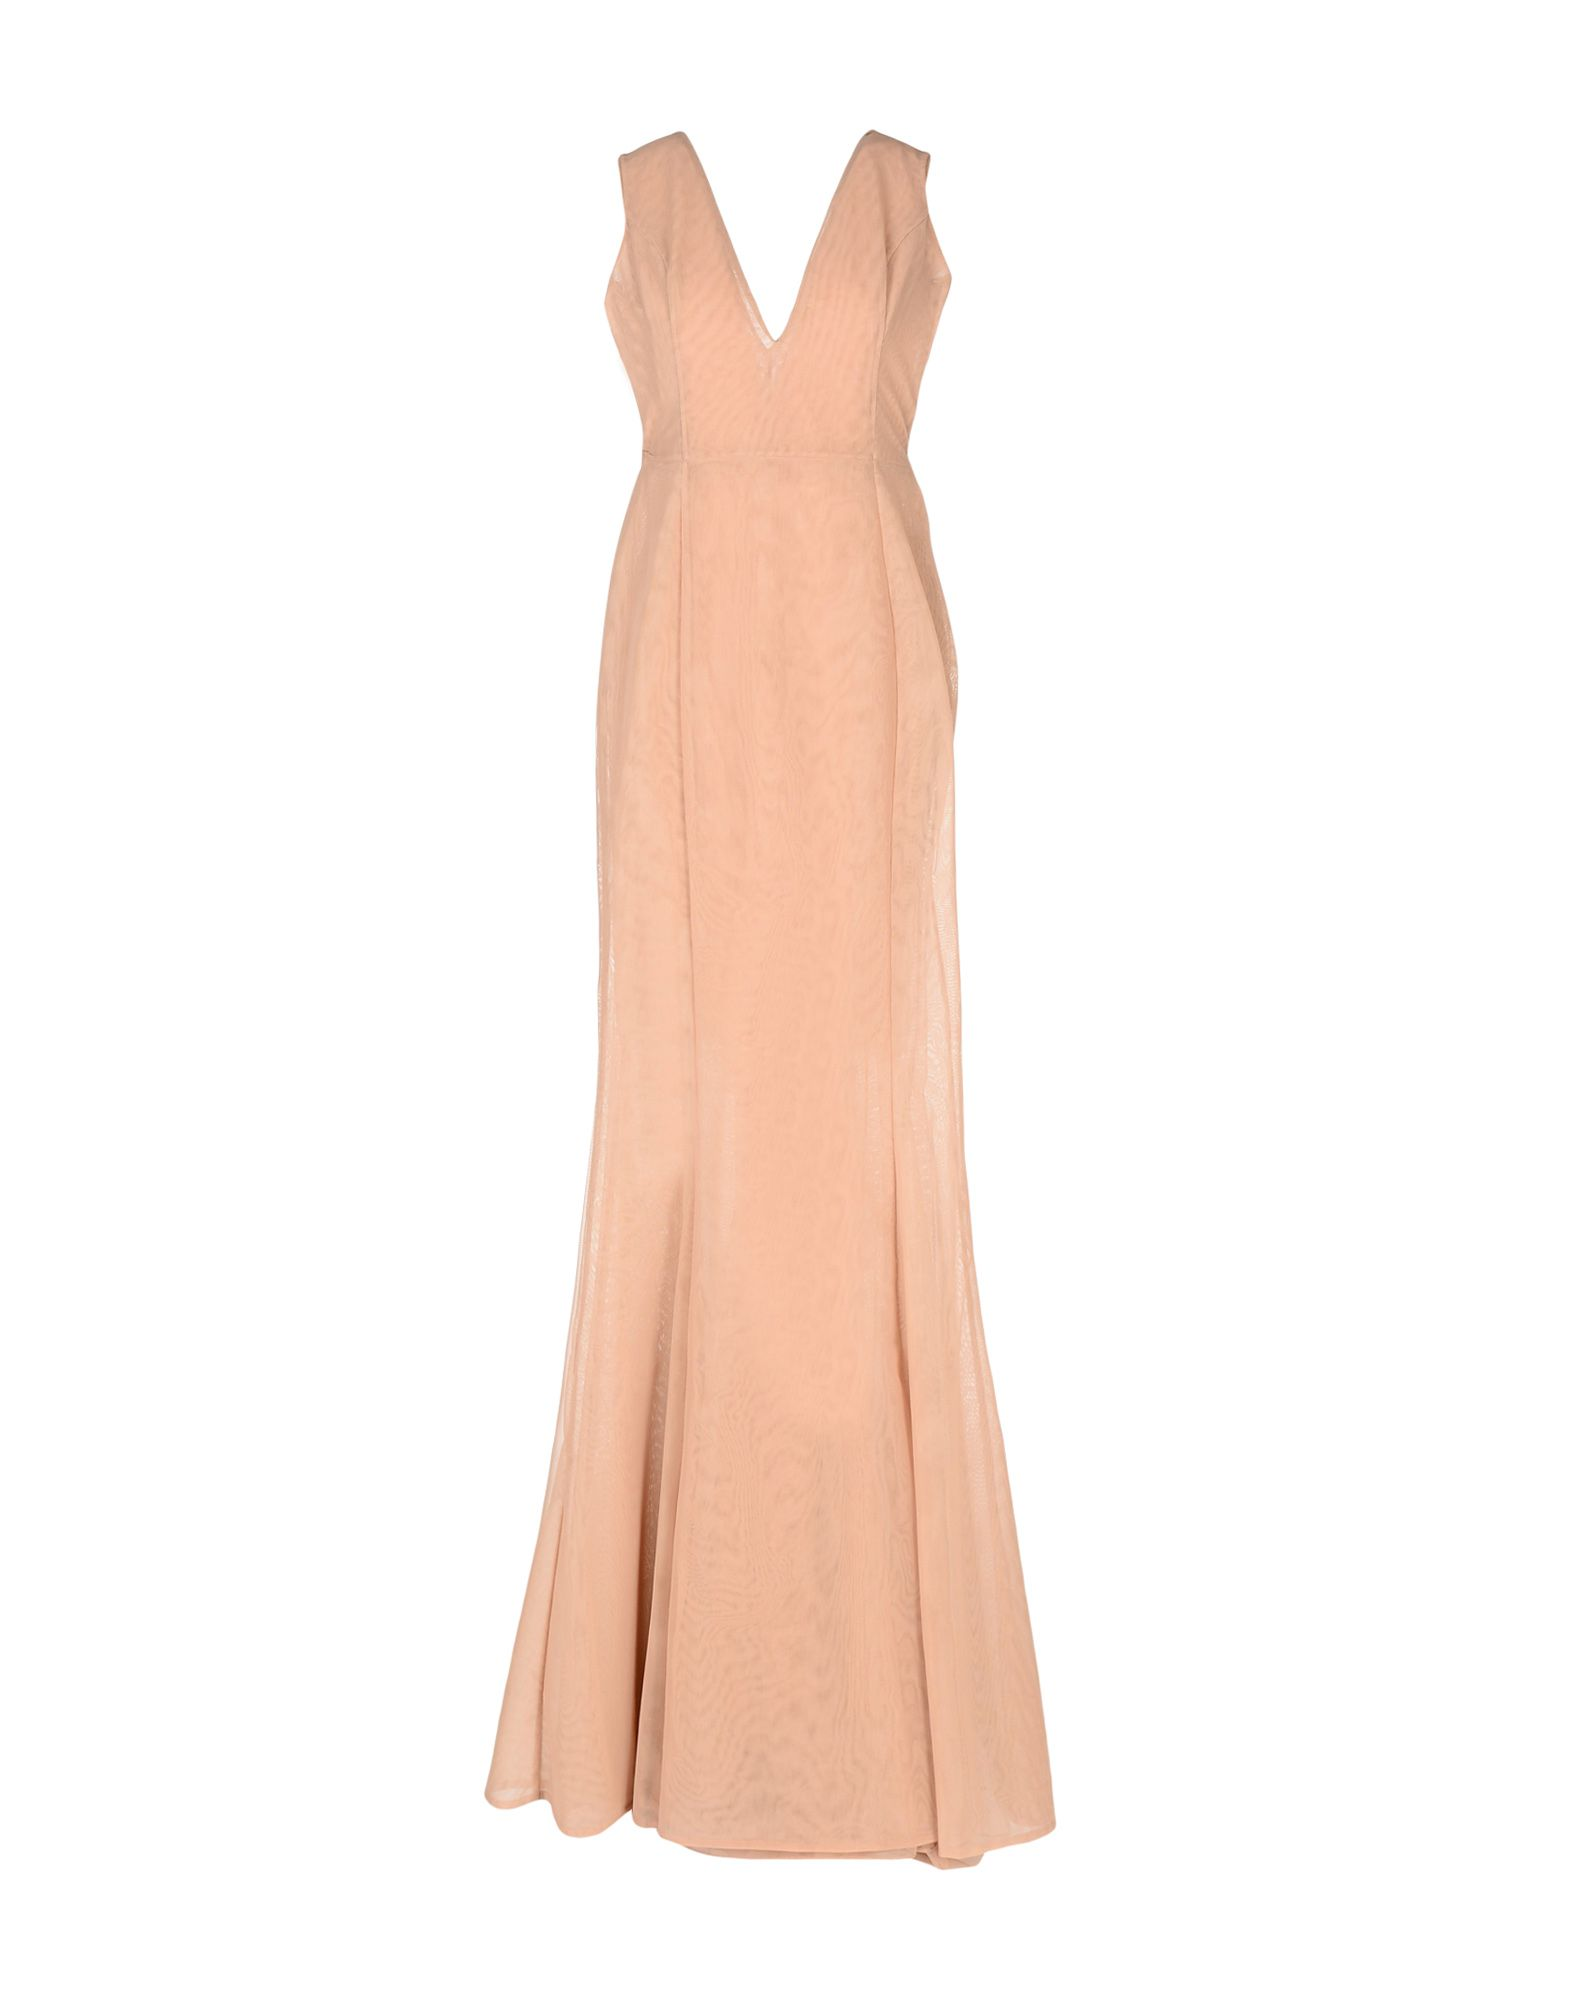 MICHAEL KORS COLLECTION Длинное платье michael kors collection длинное платье